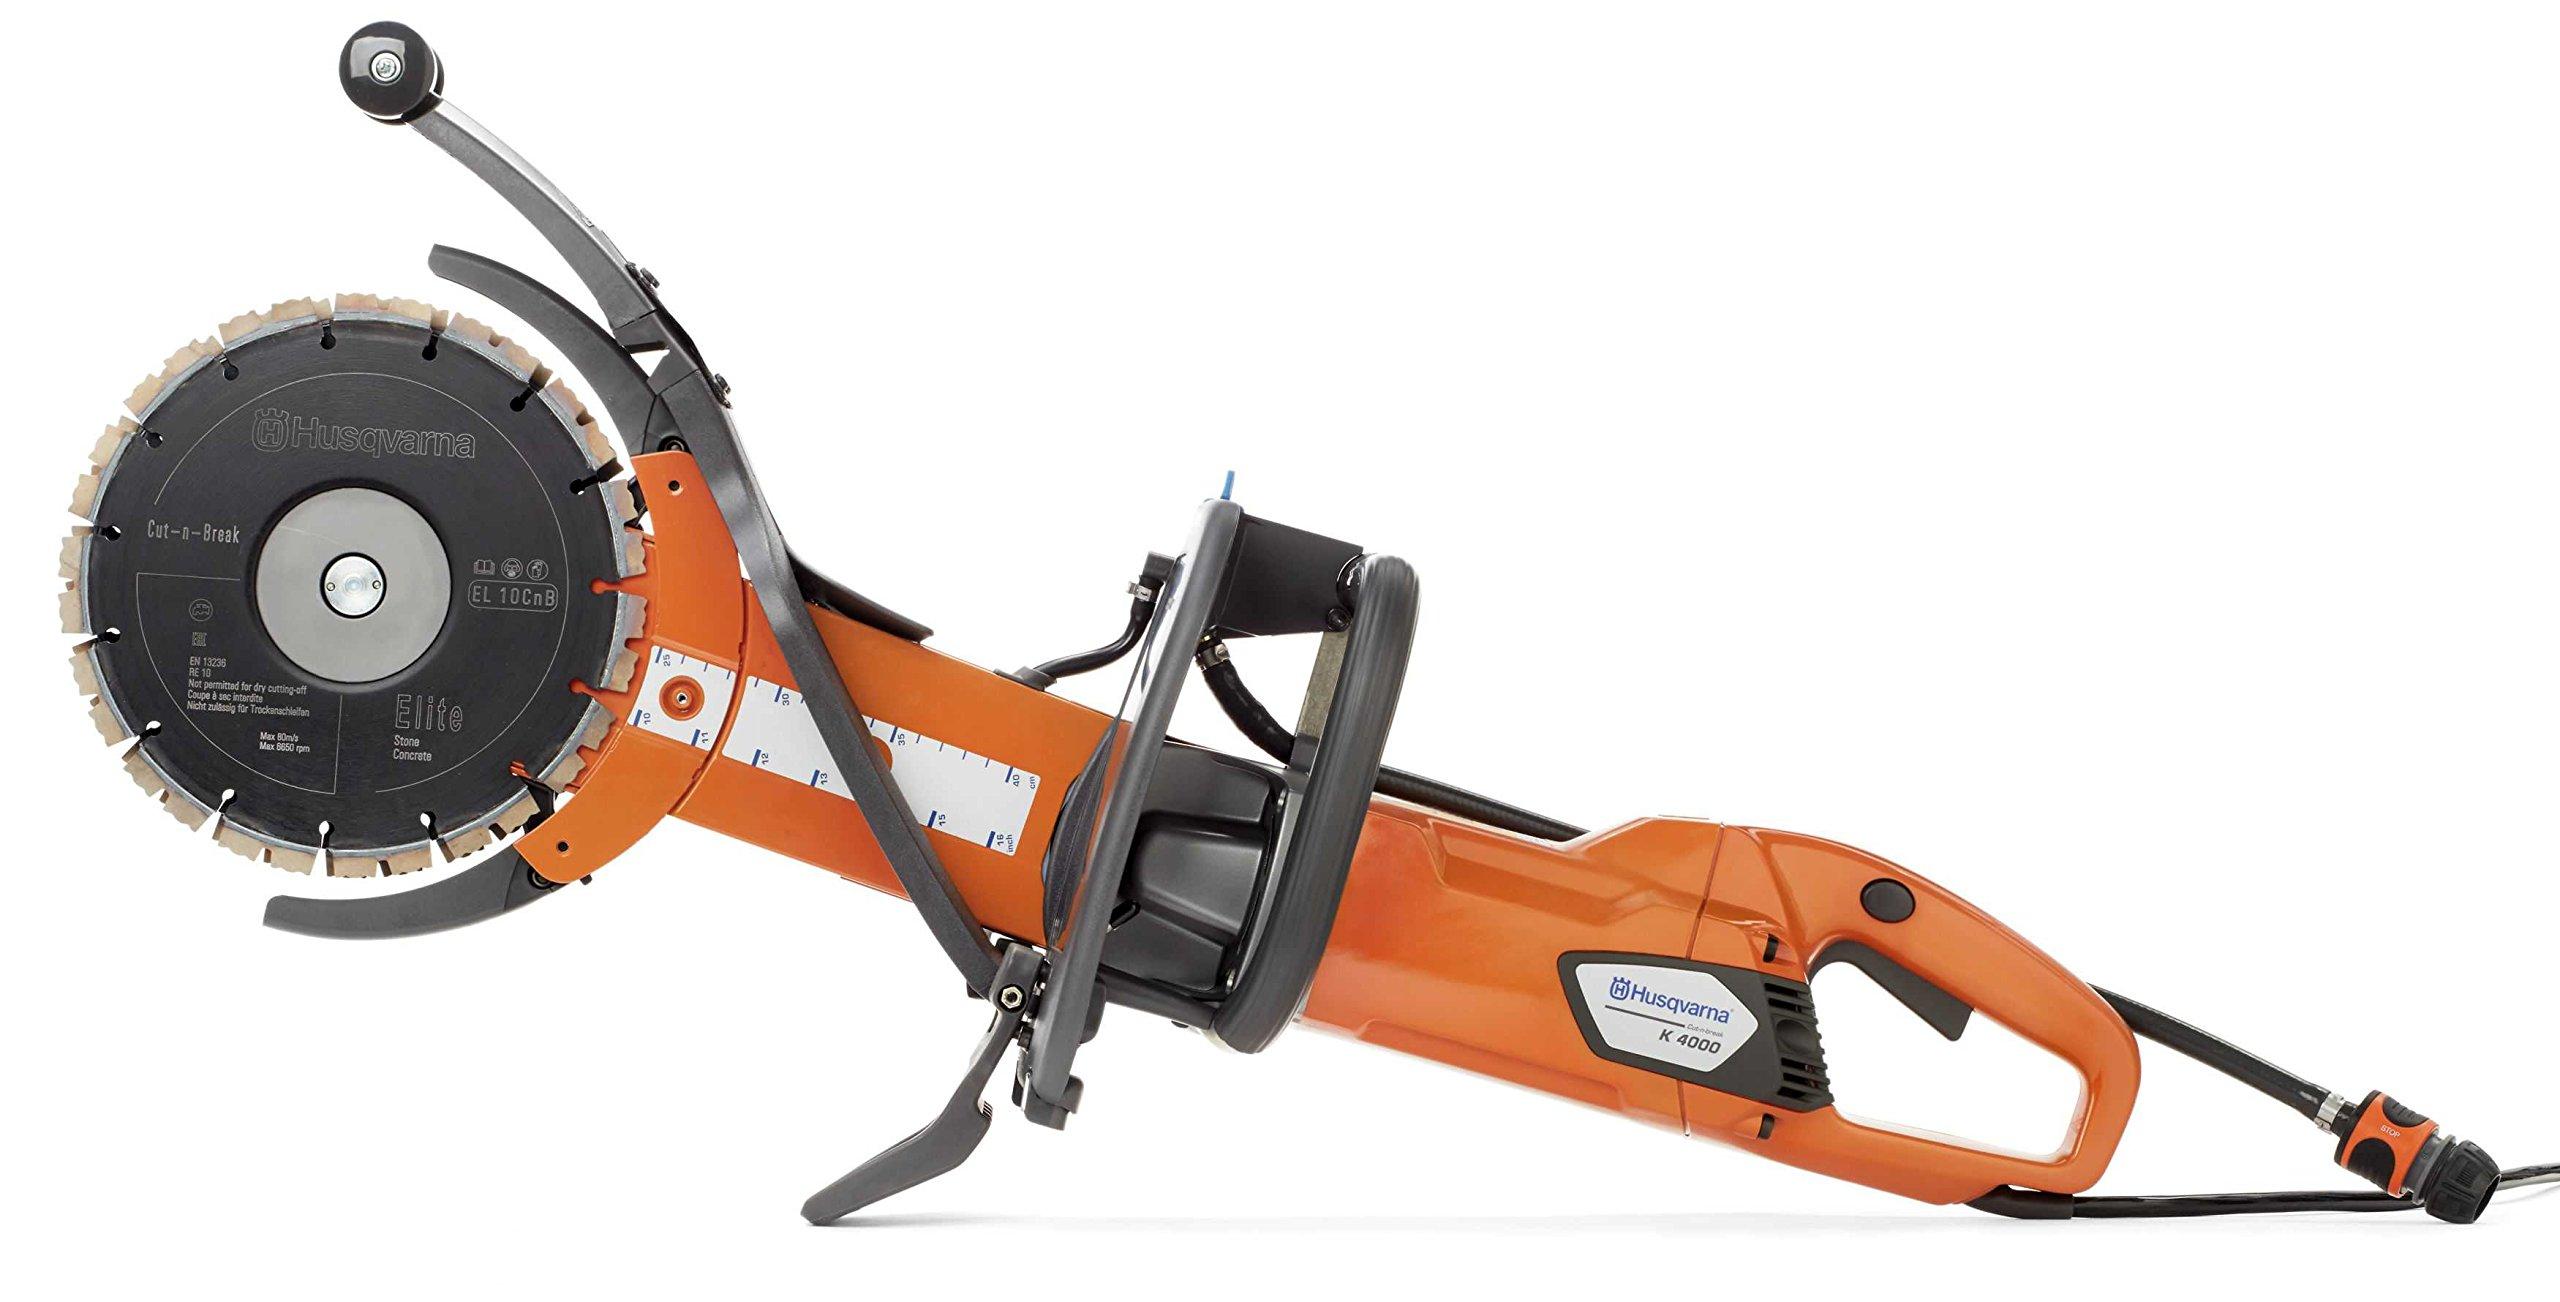 Husqvarna K4000/Cut N Break Amoladora Neum/ática 400/Mm Profundidad De Corte